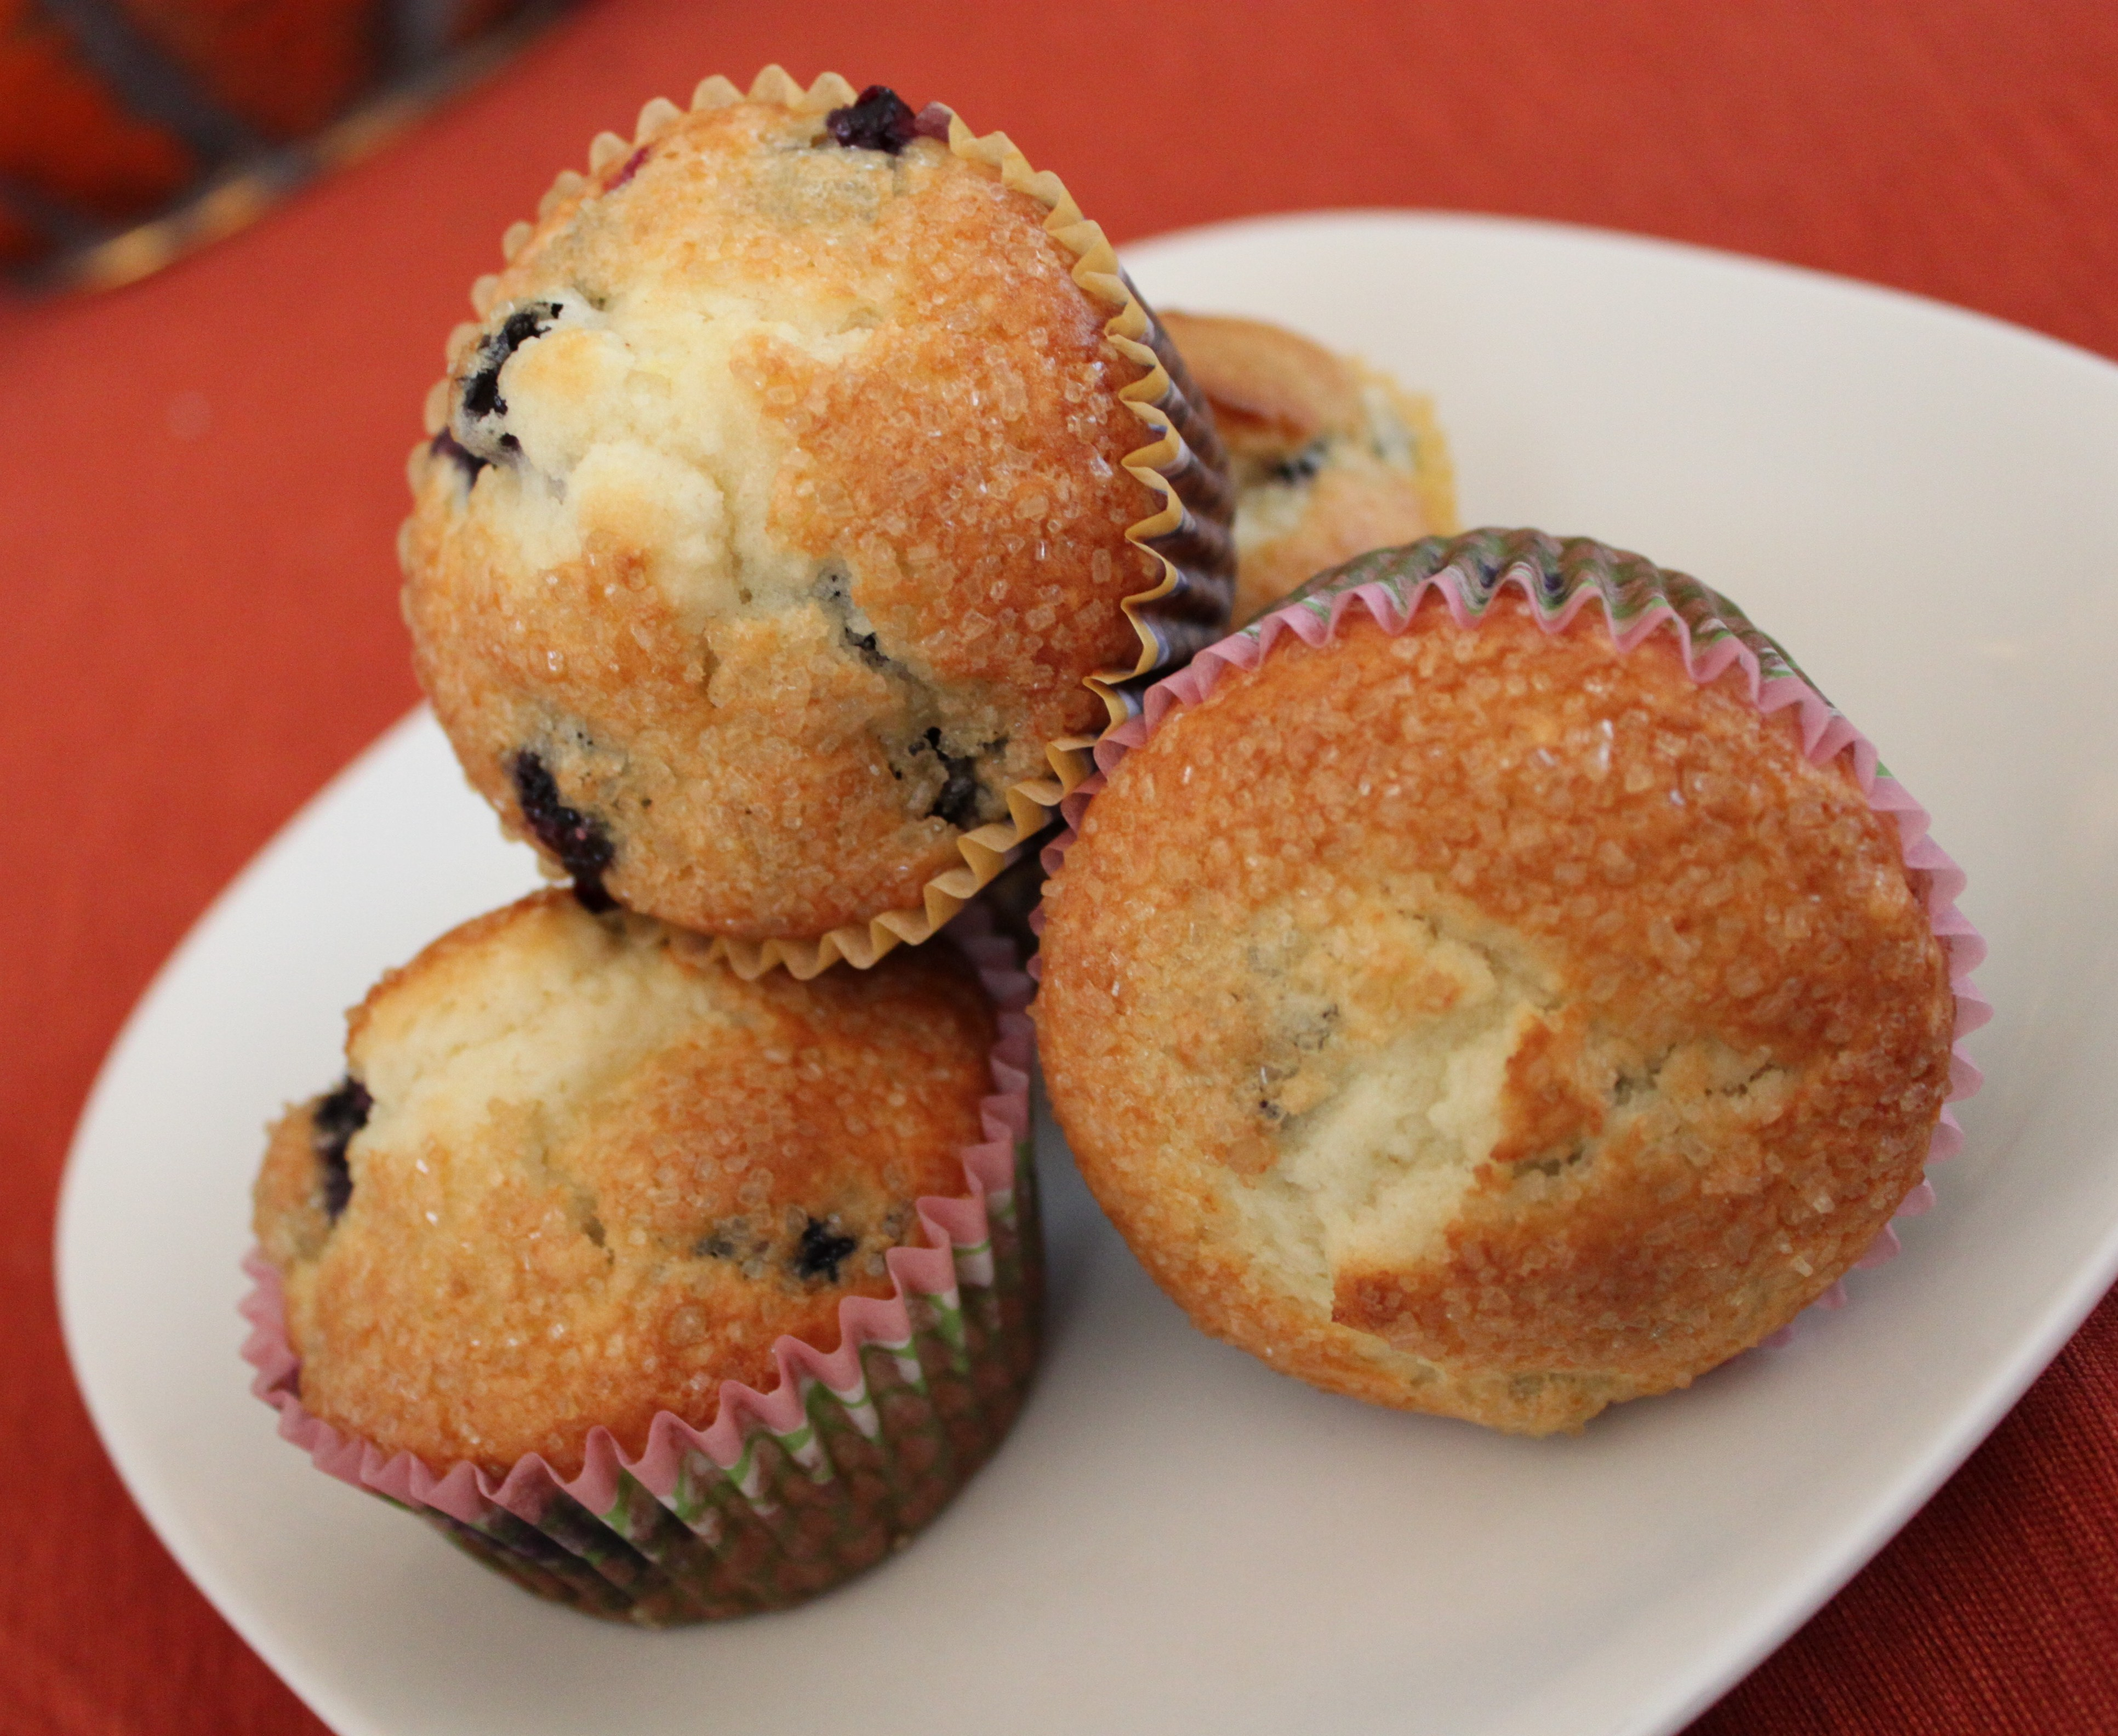 Рецепт кексов домашних условиях в рецепт с фото